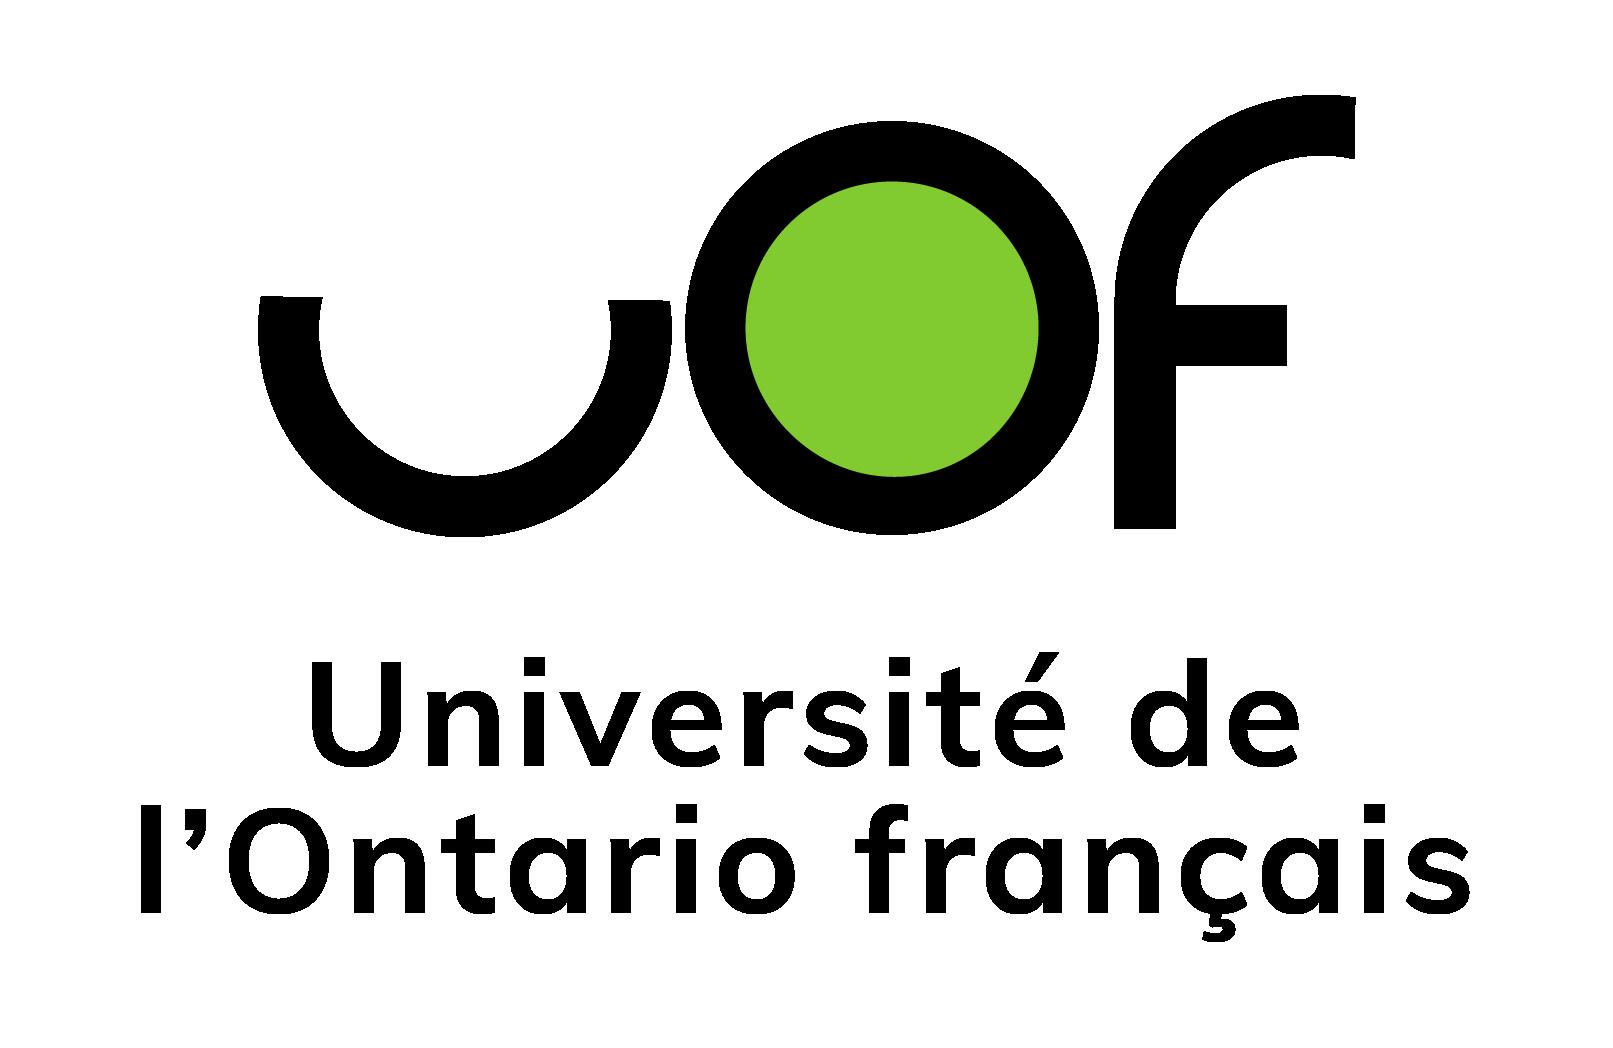 Université de l'Ontario français